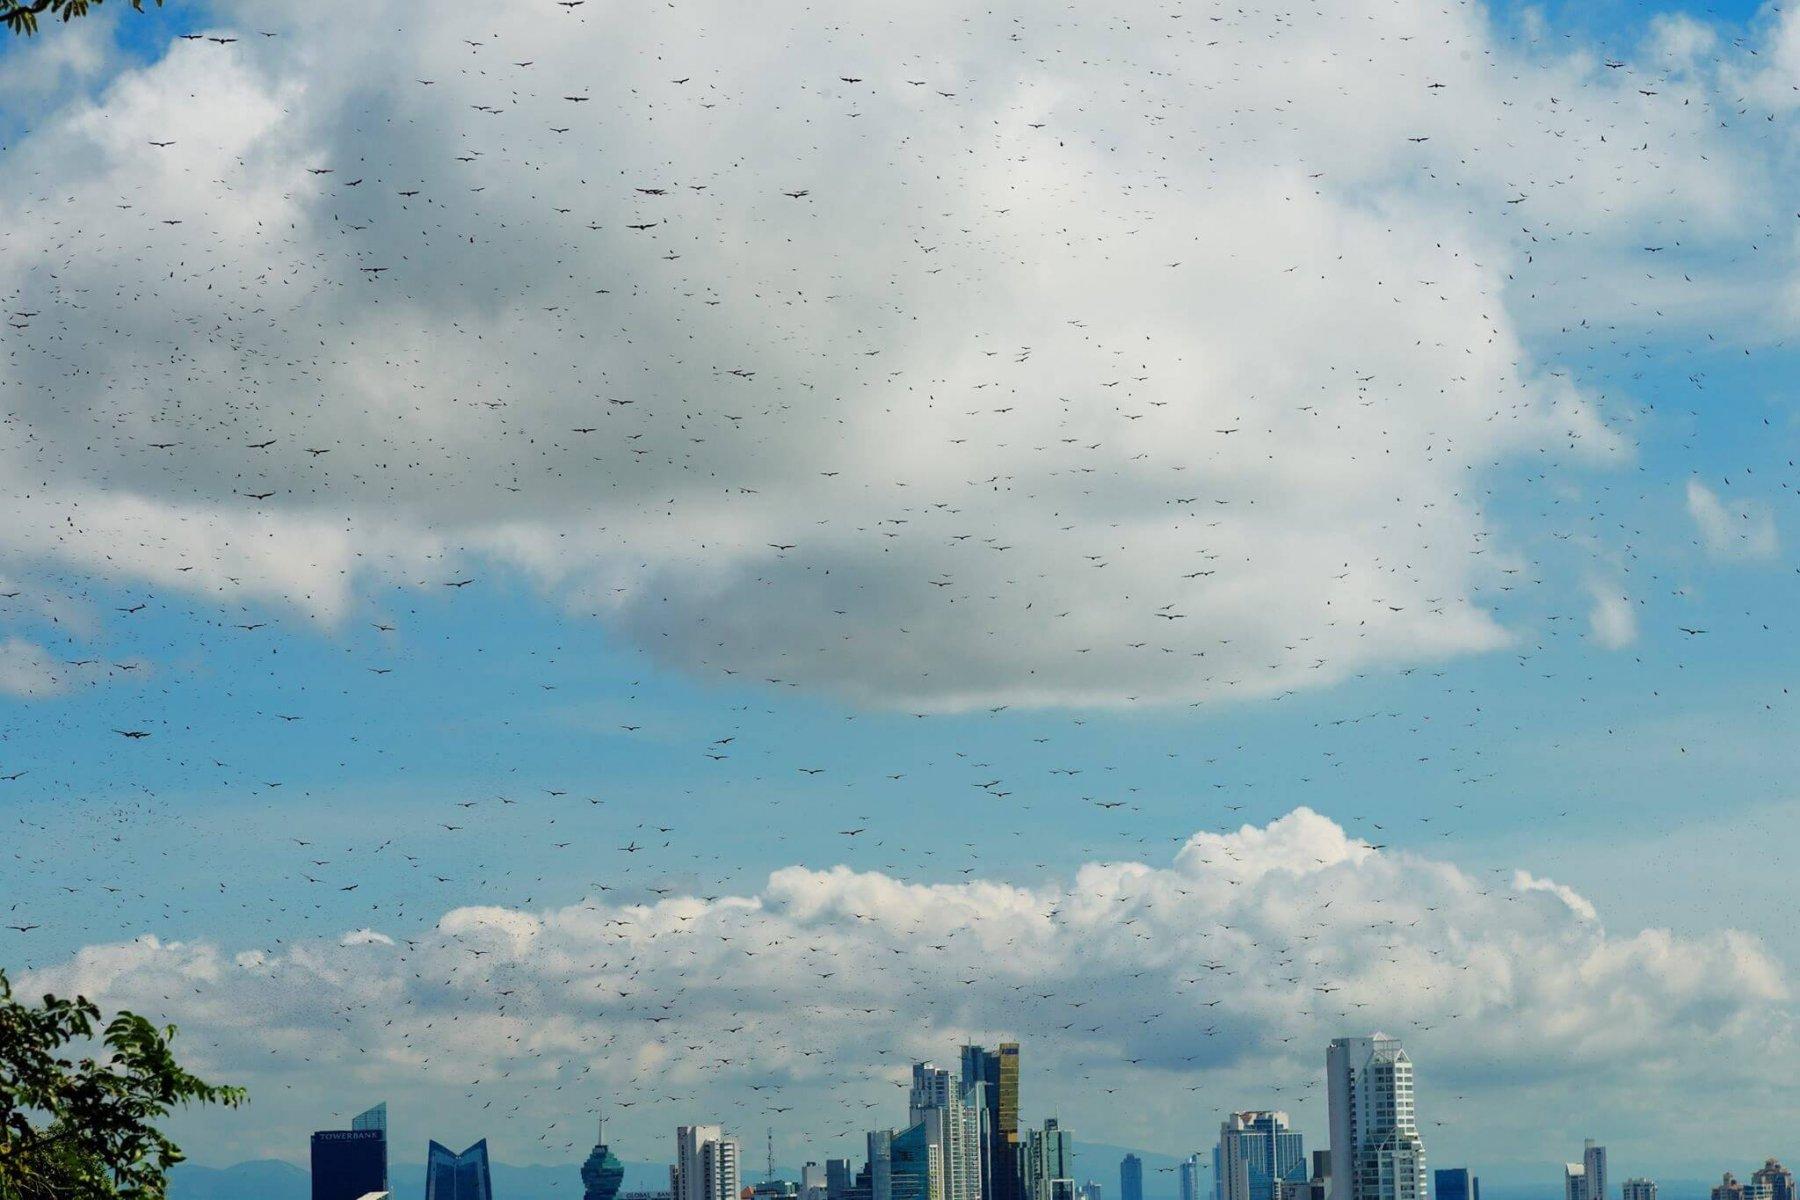 Raptors congregate in the skies above Panama City © Alvaro Moises